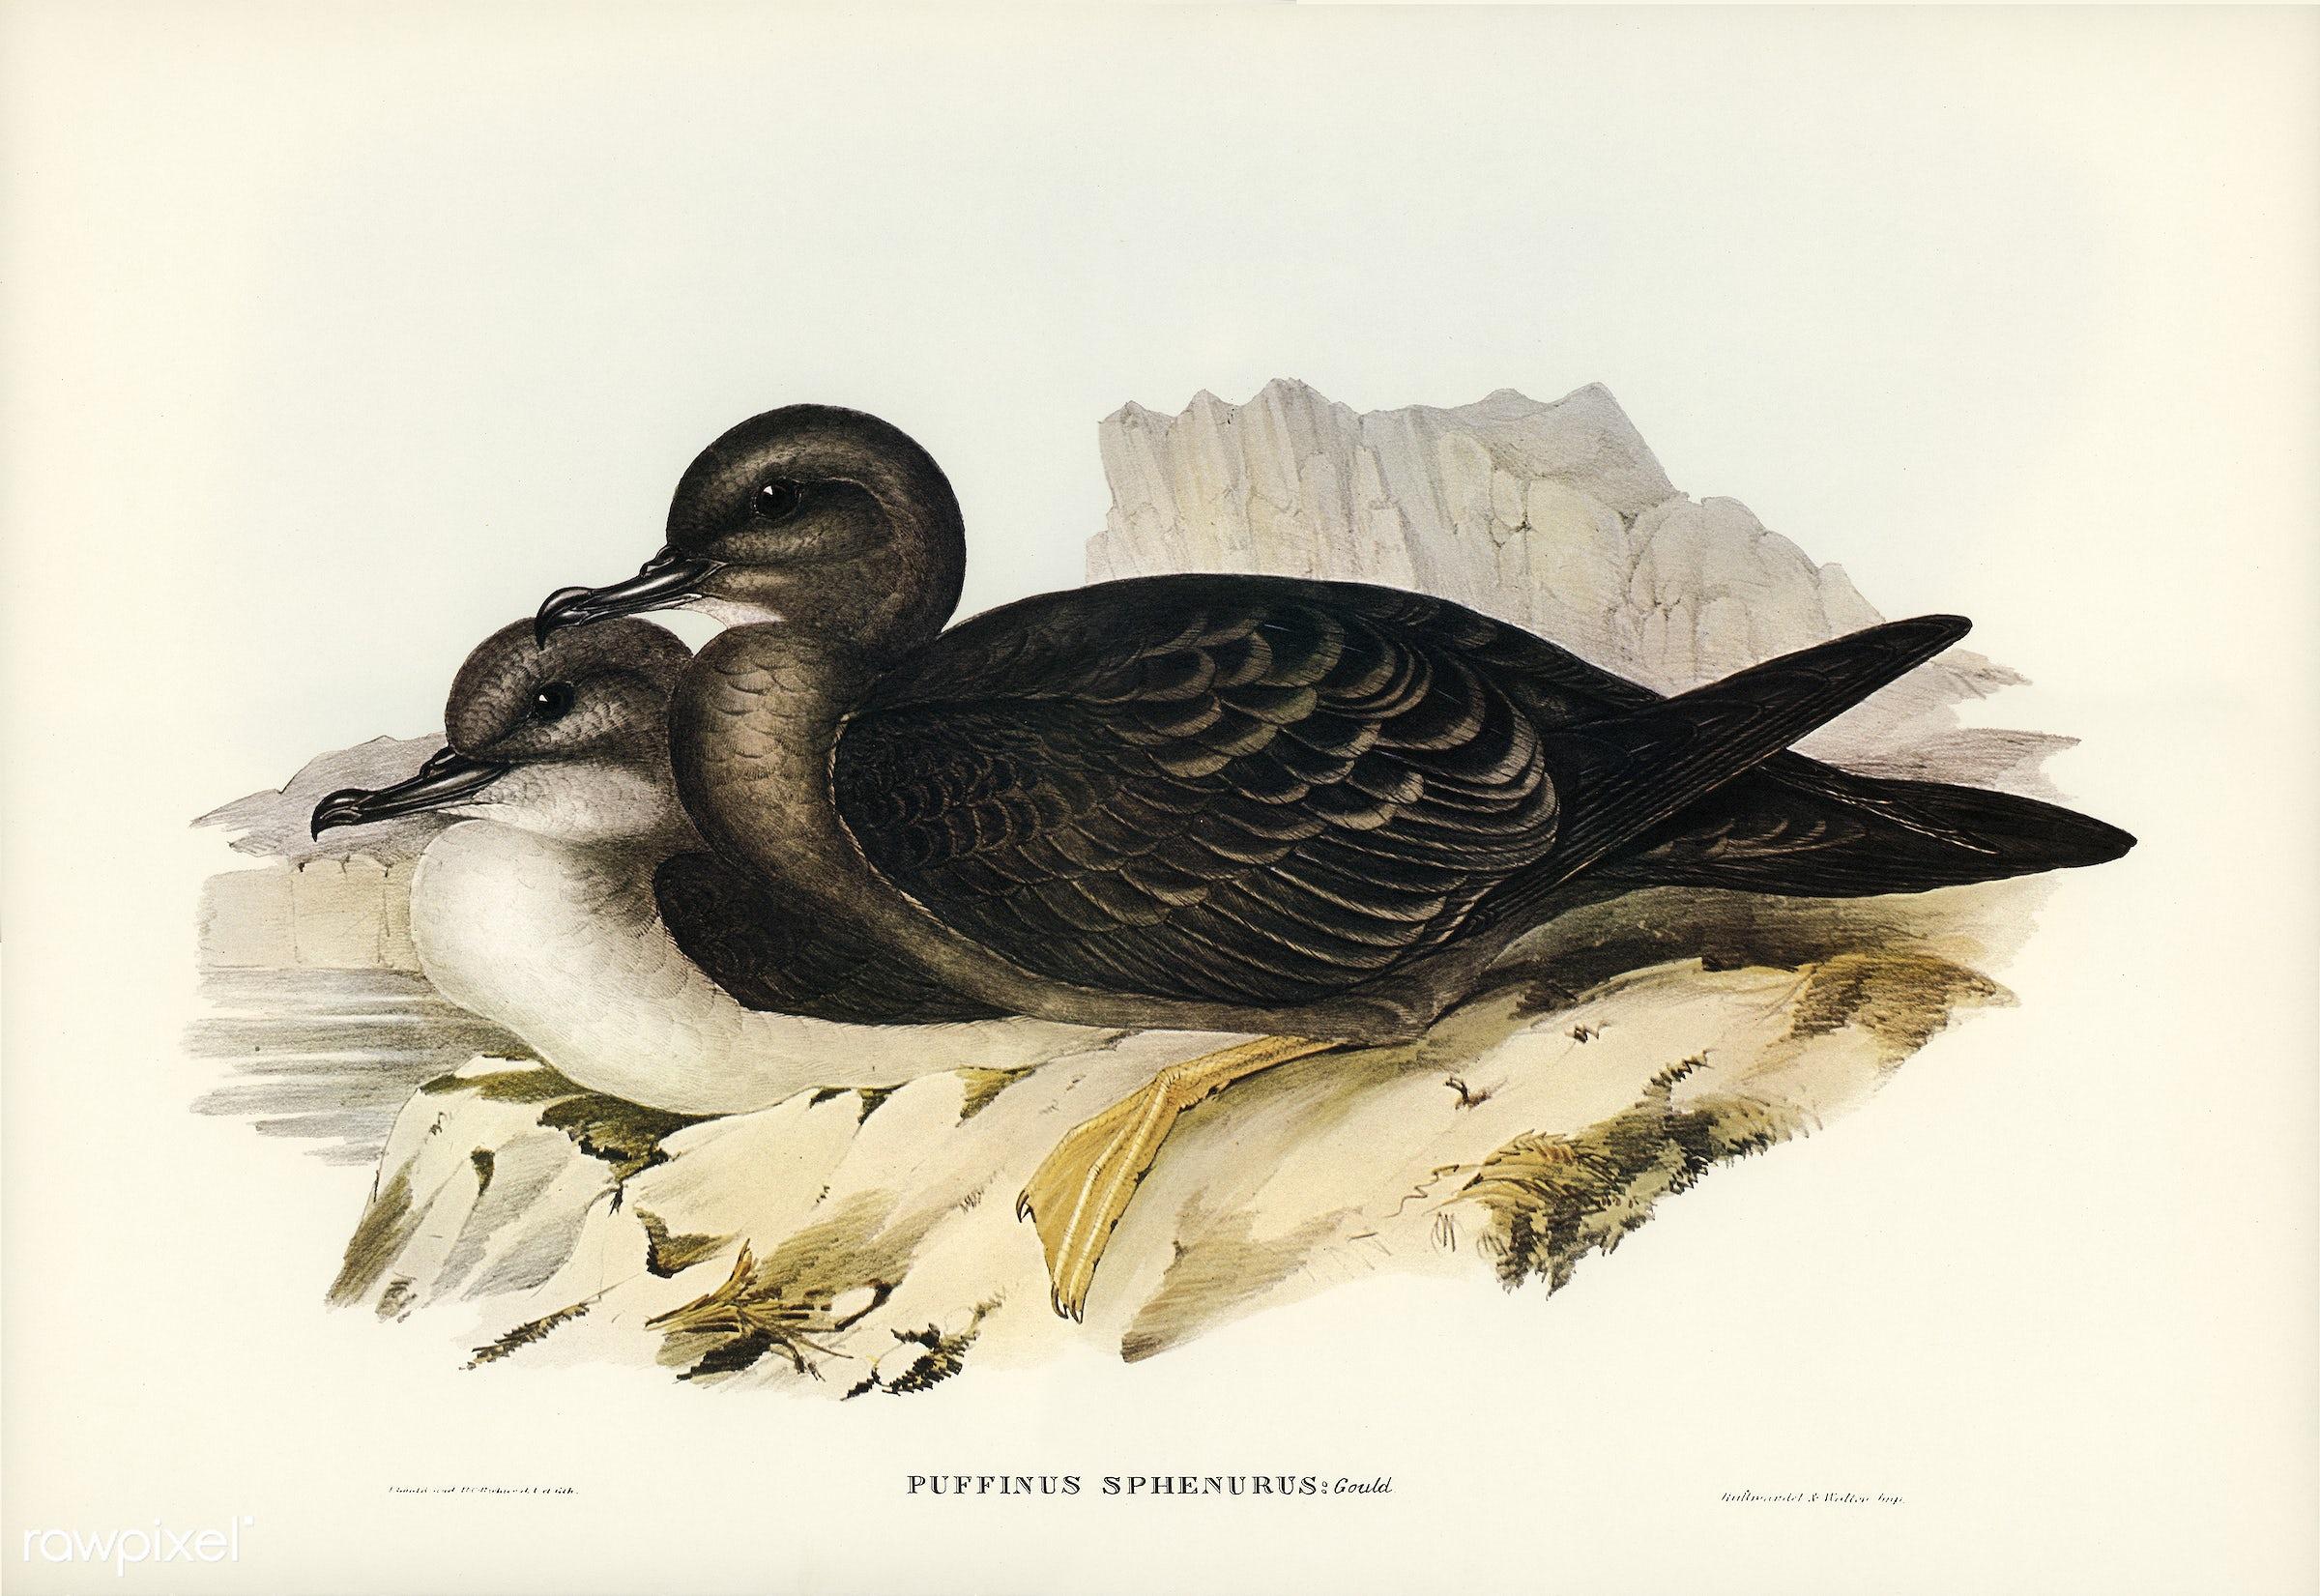 Wedge-tailed Petrel (Puffinus sphenurus) iillustrated by Elizabeth Gould (1804–1841) for John Gould's (1804-1881...